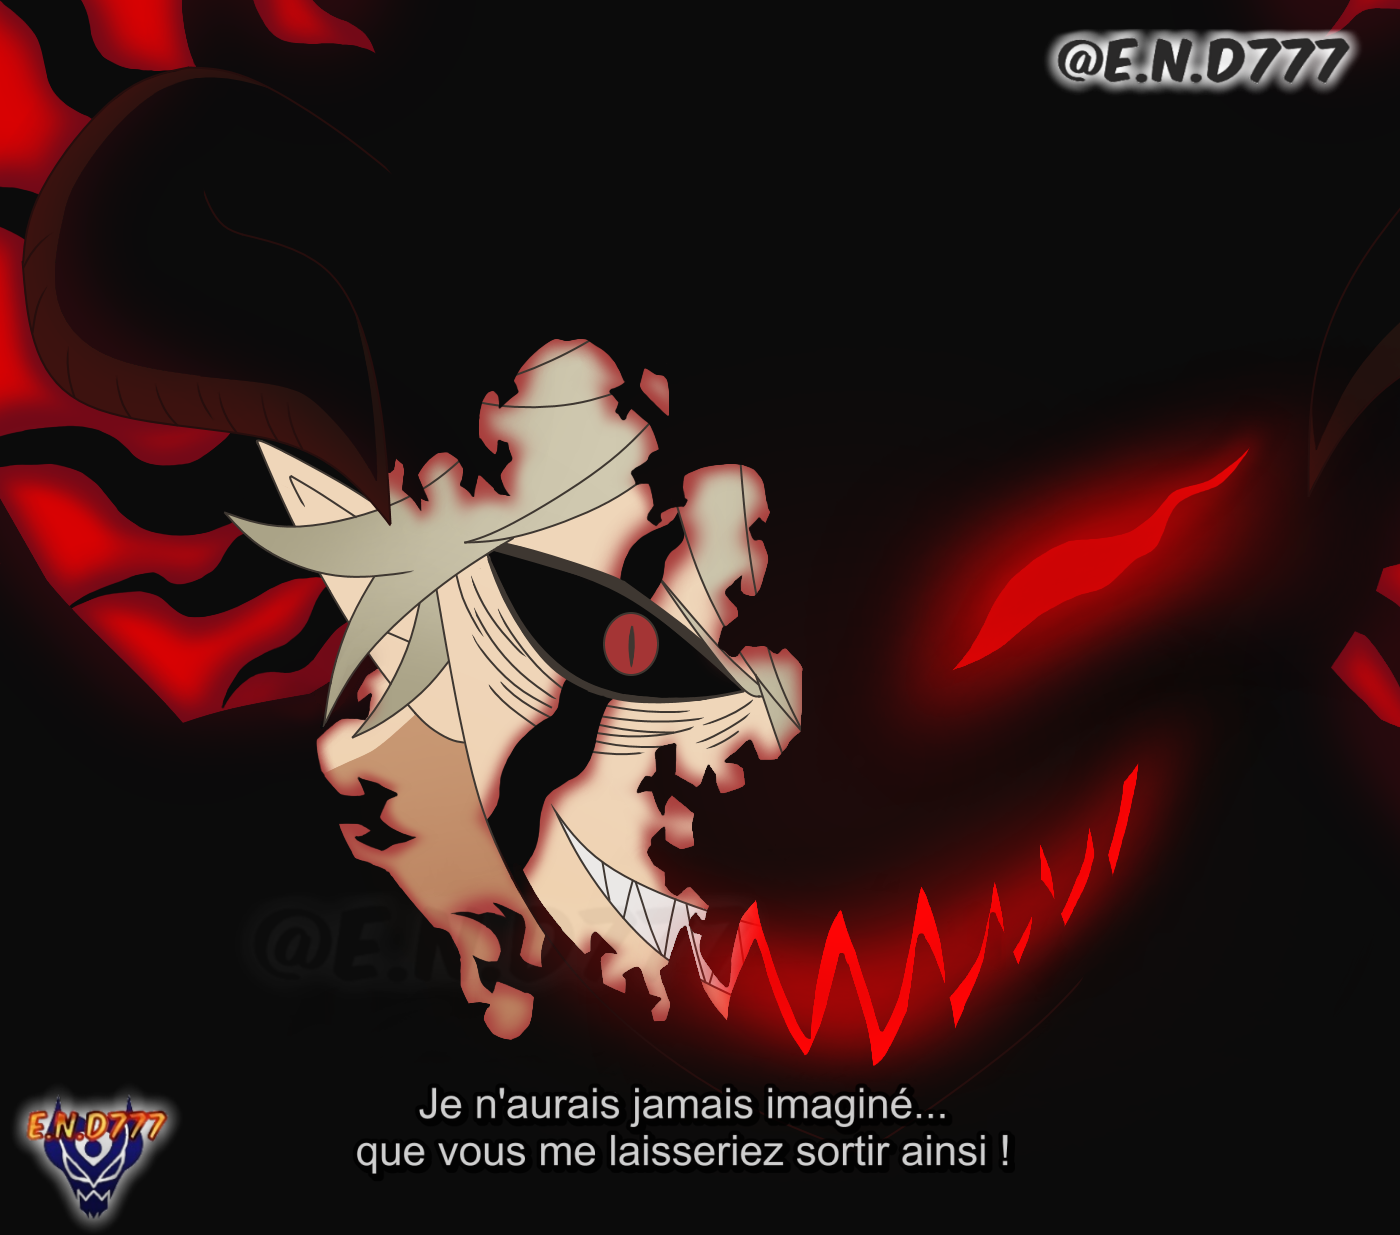 Black Clover 266 Asta S Demon Liberation By End7777 On Deviantart